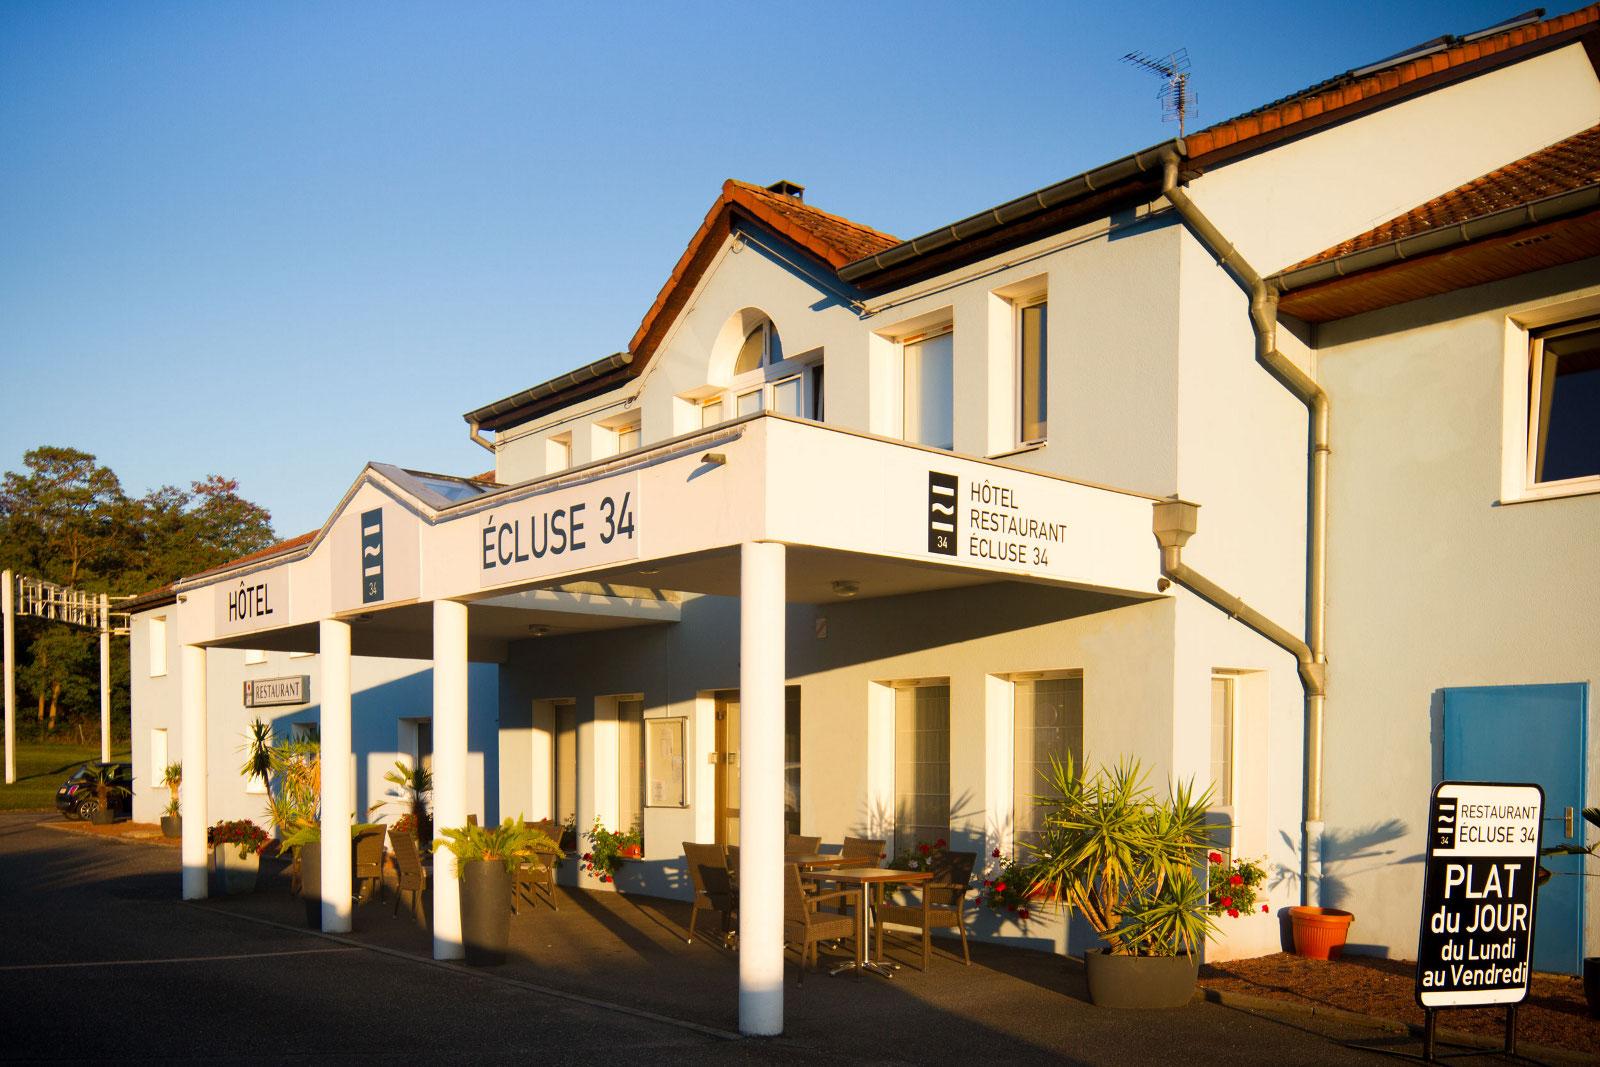 Hôtel Restaurant Ecluse 34